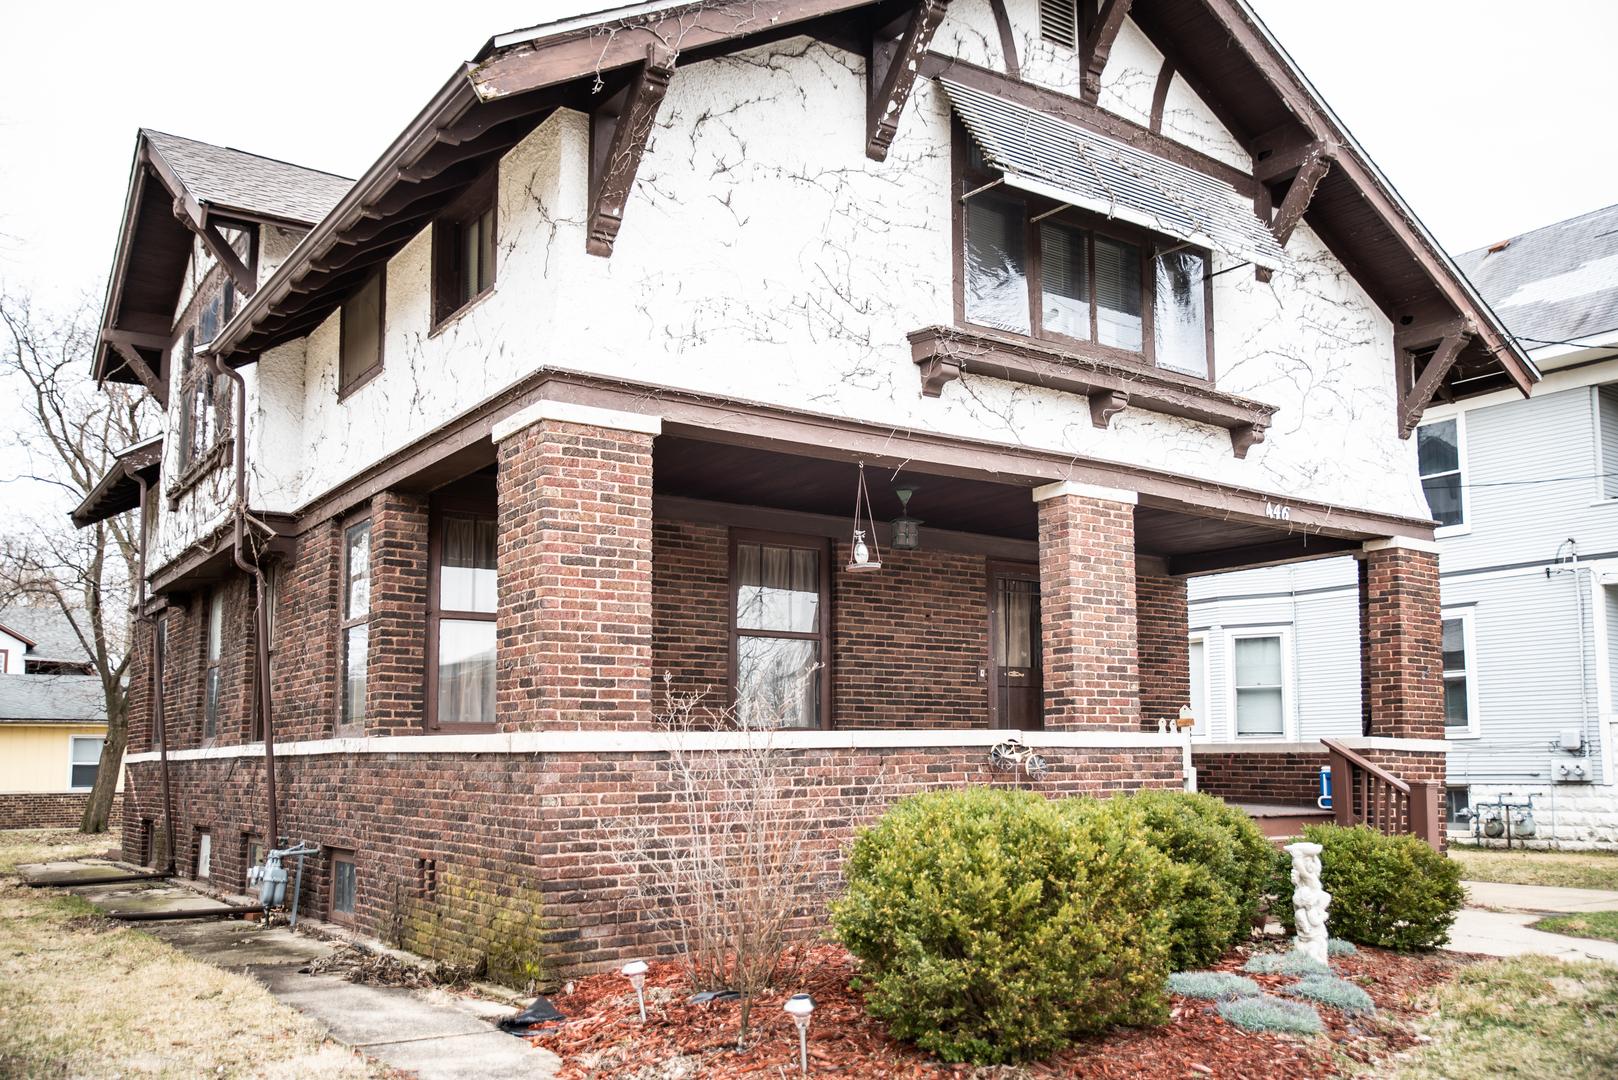 446 South 4th, AURORA, Illinois, 60505